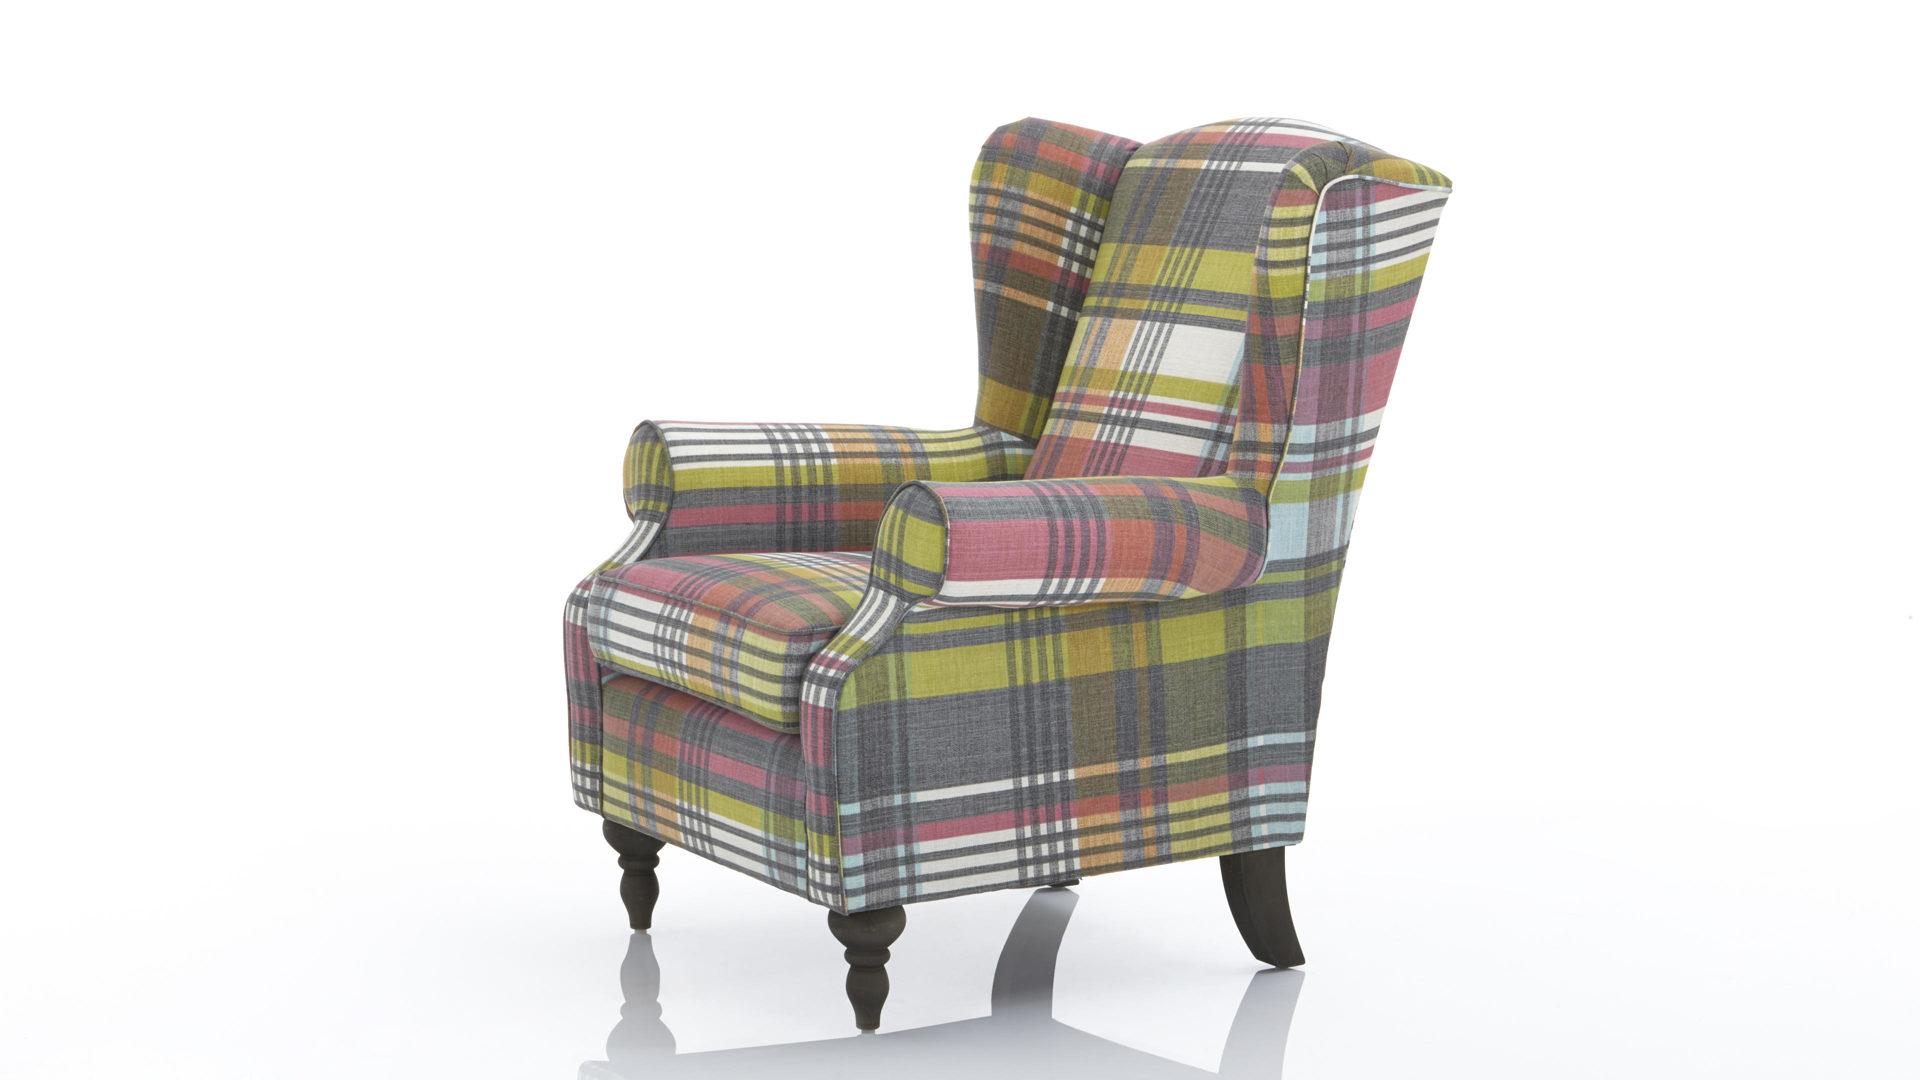 Ohrensessel mit hocker modern  Ohrensessel Mit Hocker Modern. Beautiful Sessel Kunstleder Silver ...